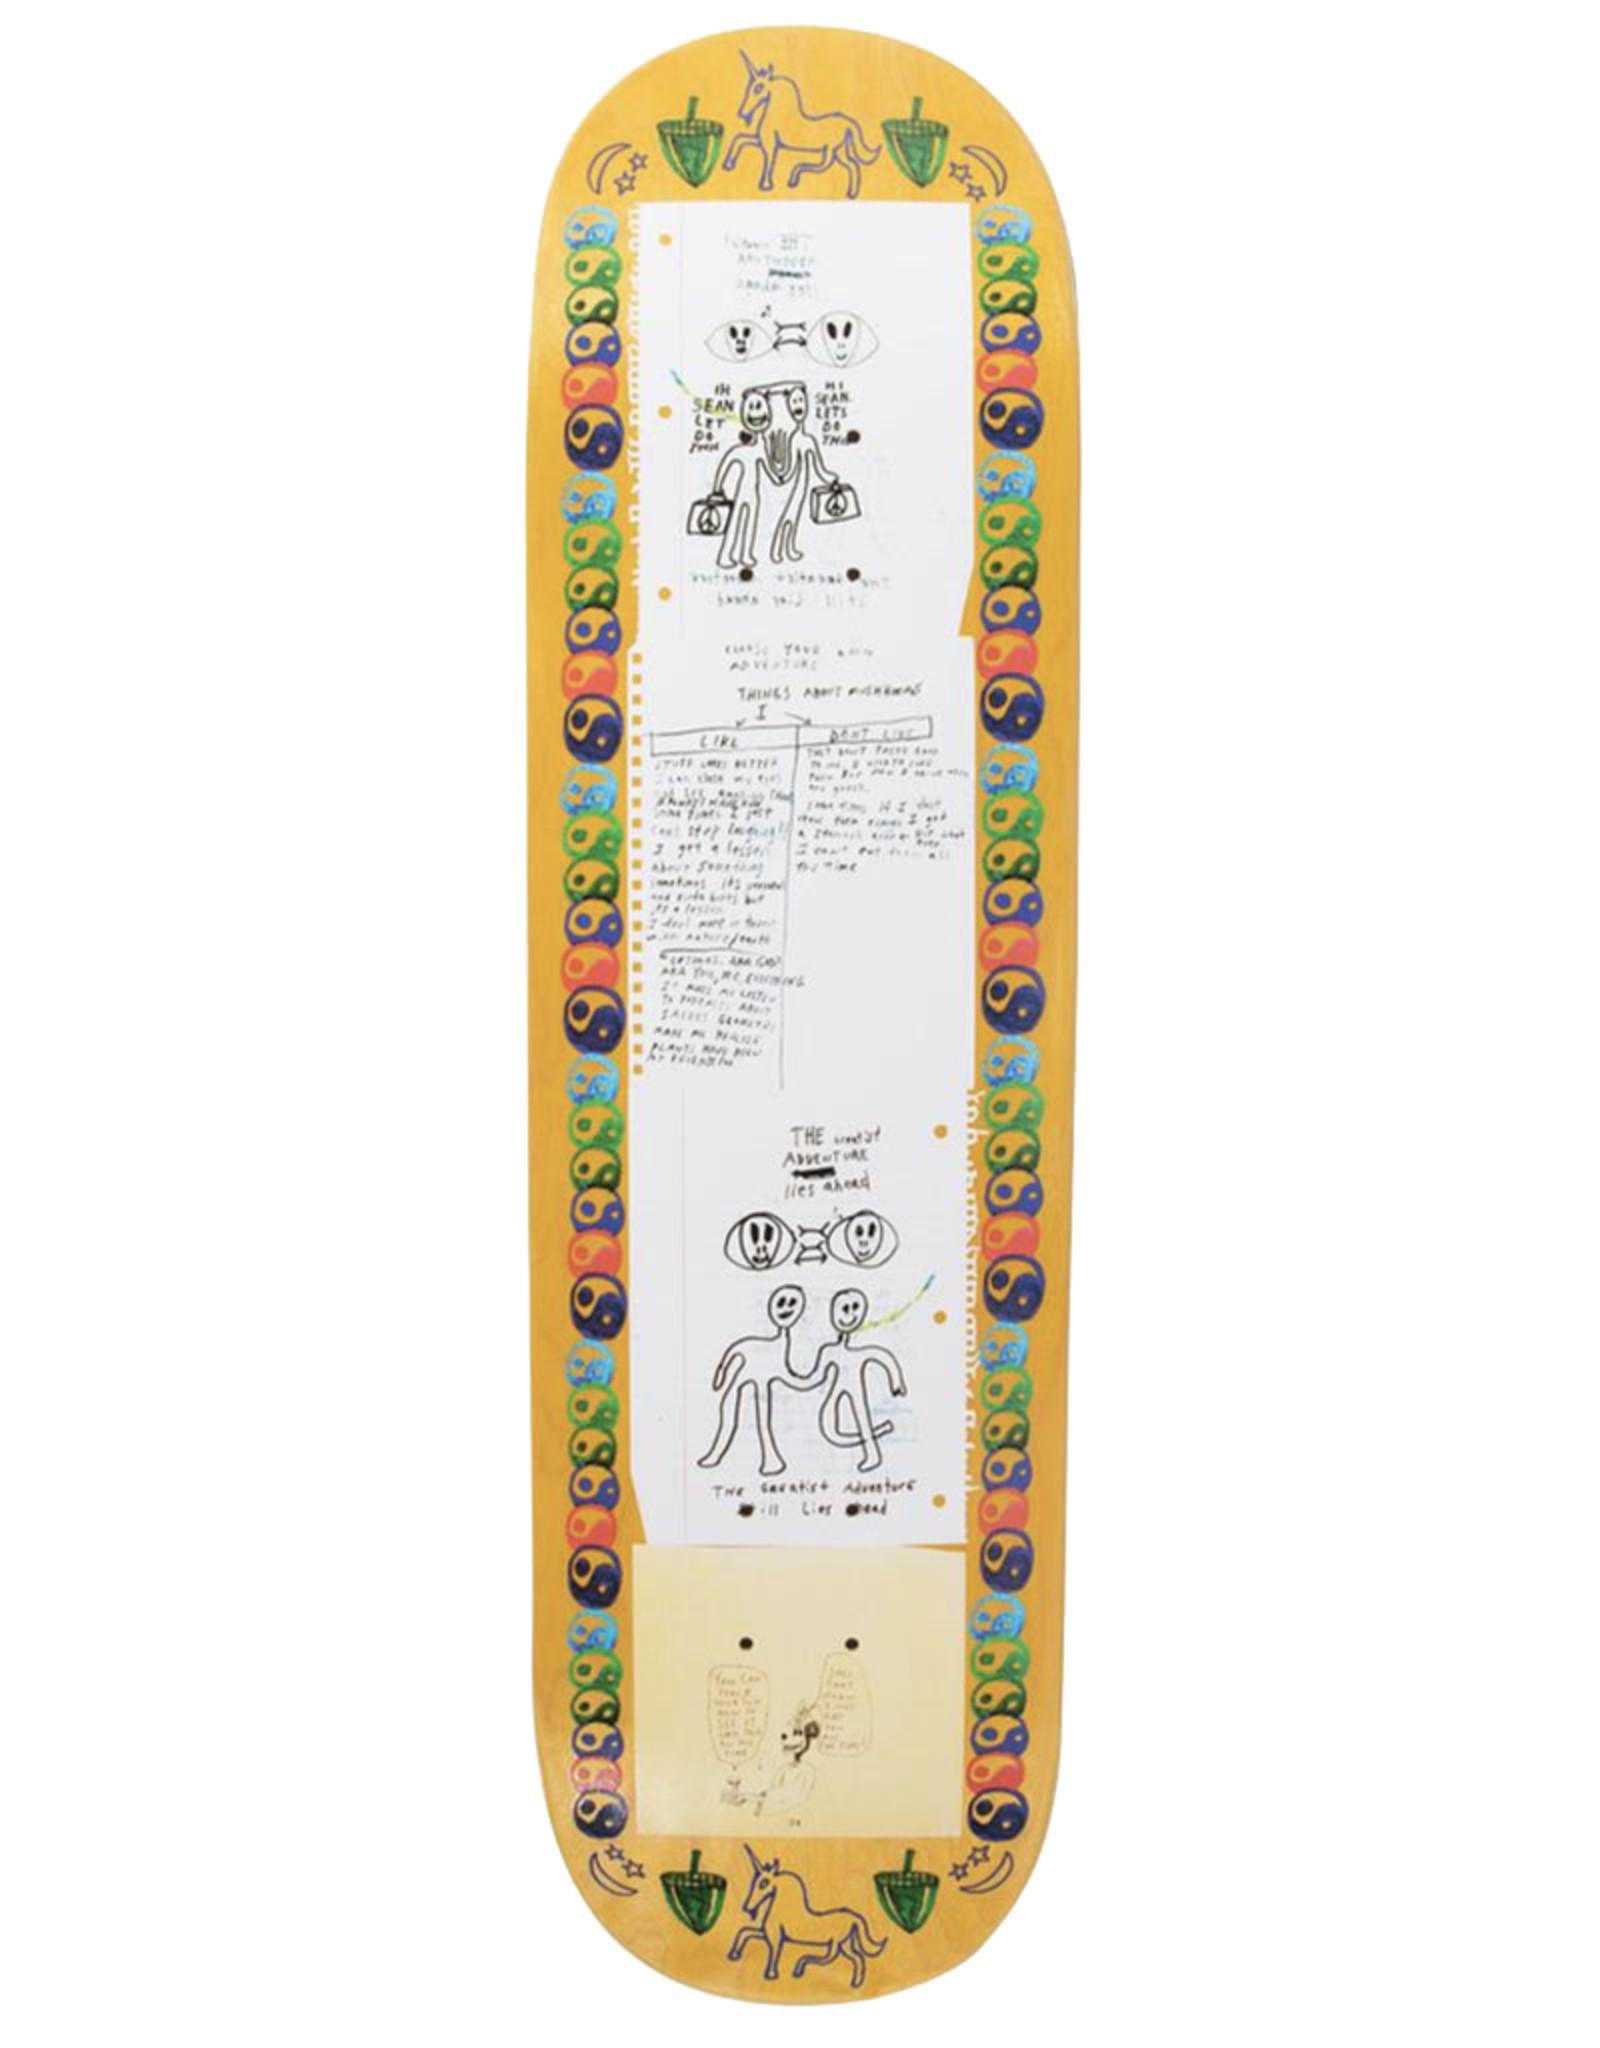 GX1000 GX-1000 Deck Sean Greene Pro Debut II Yellow (8.5)